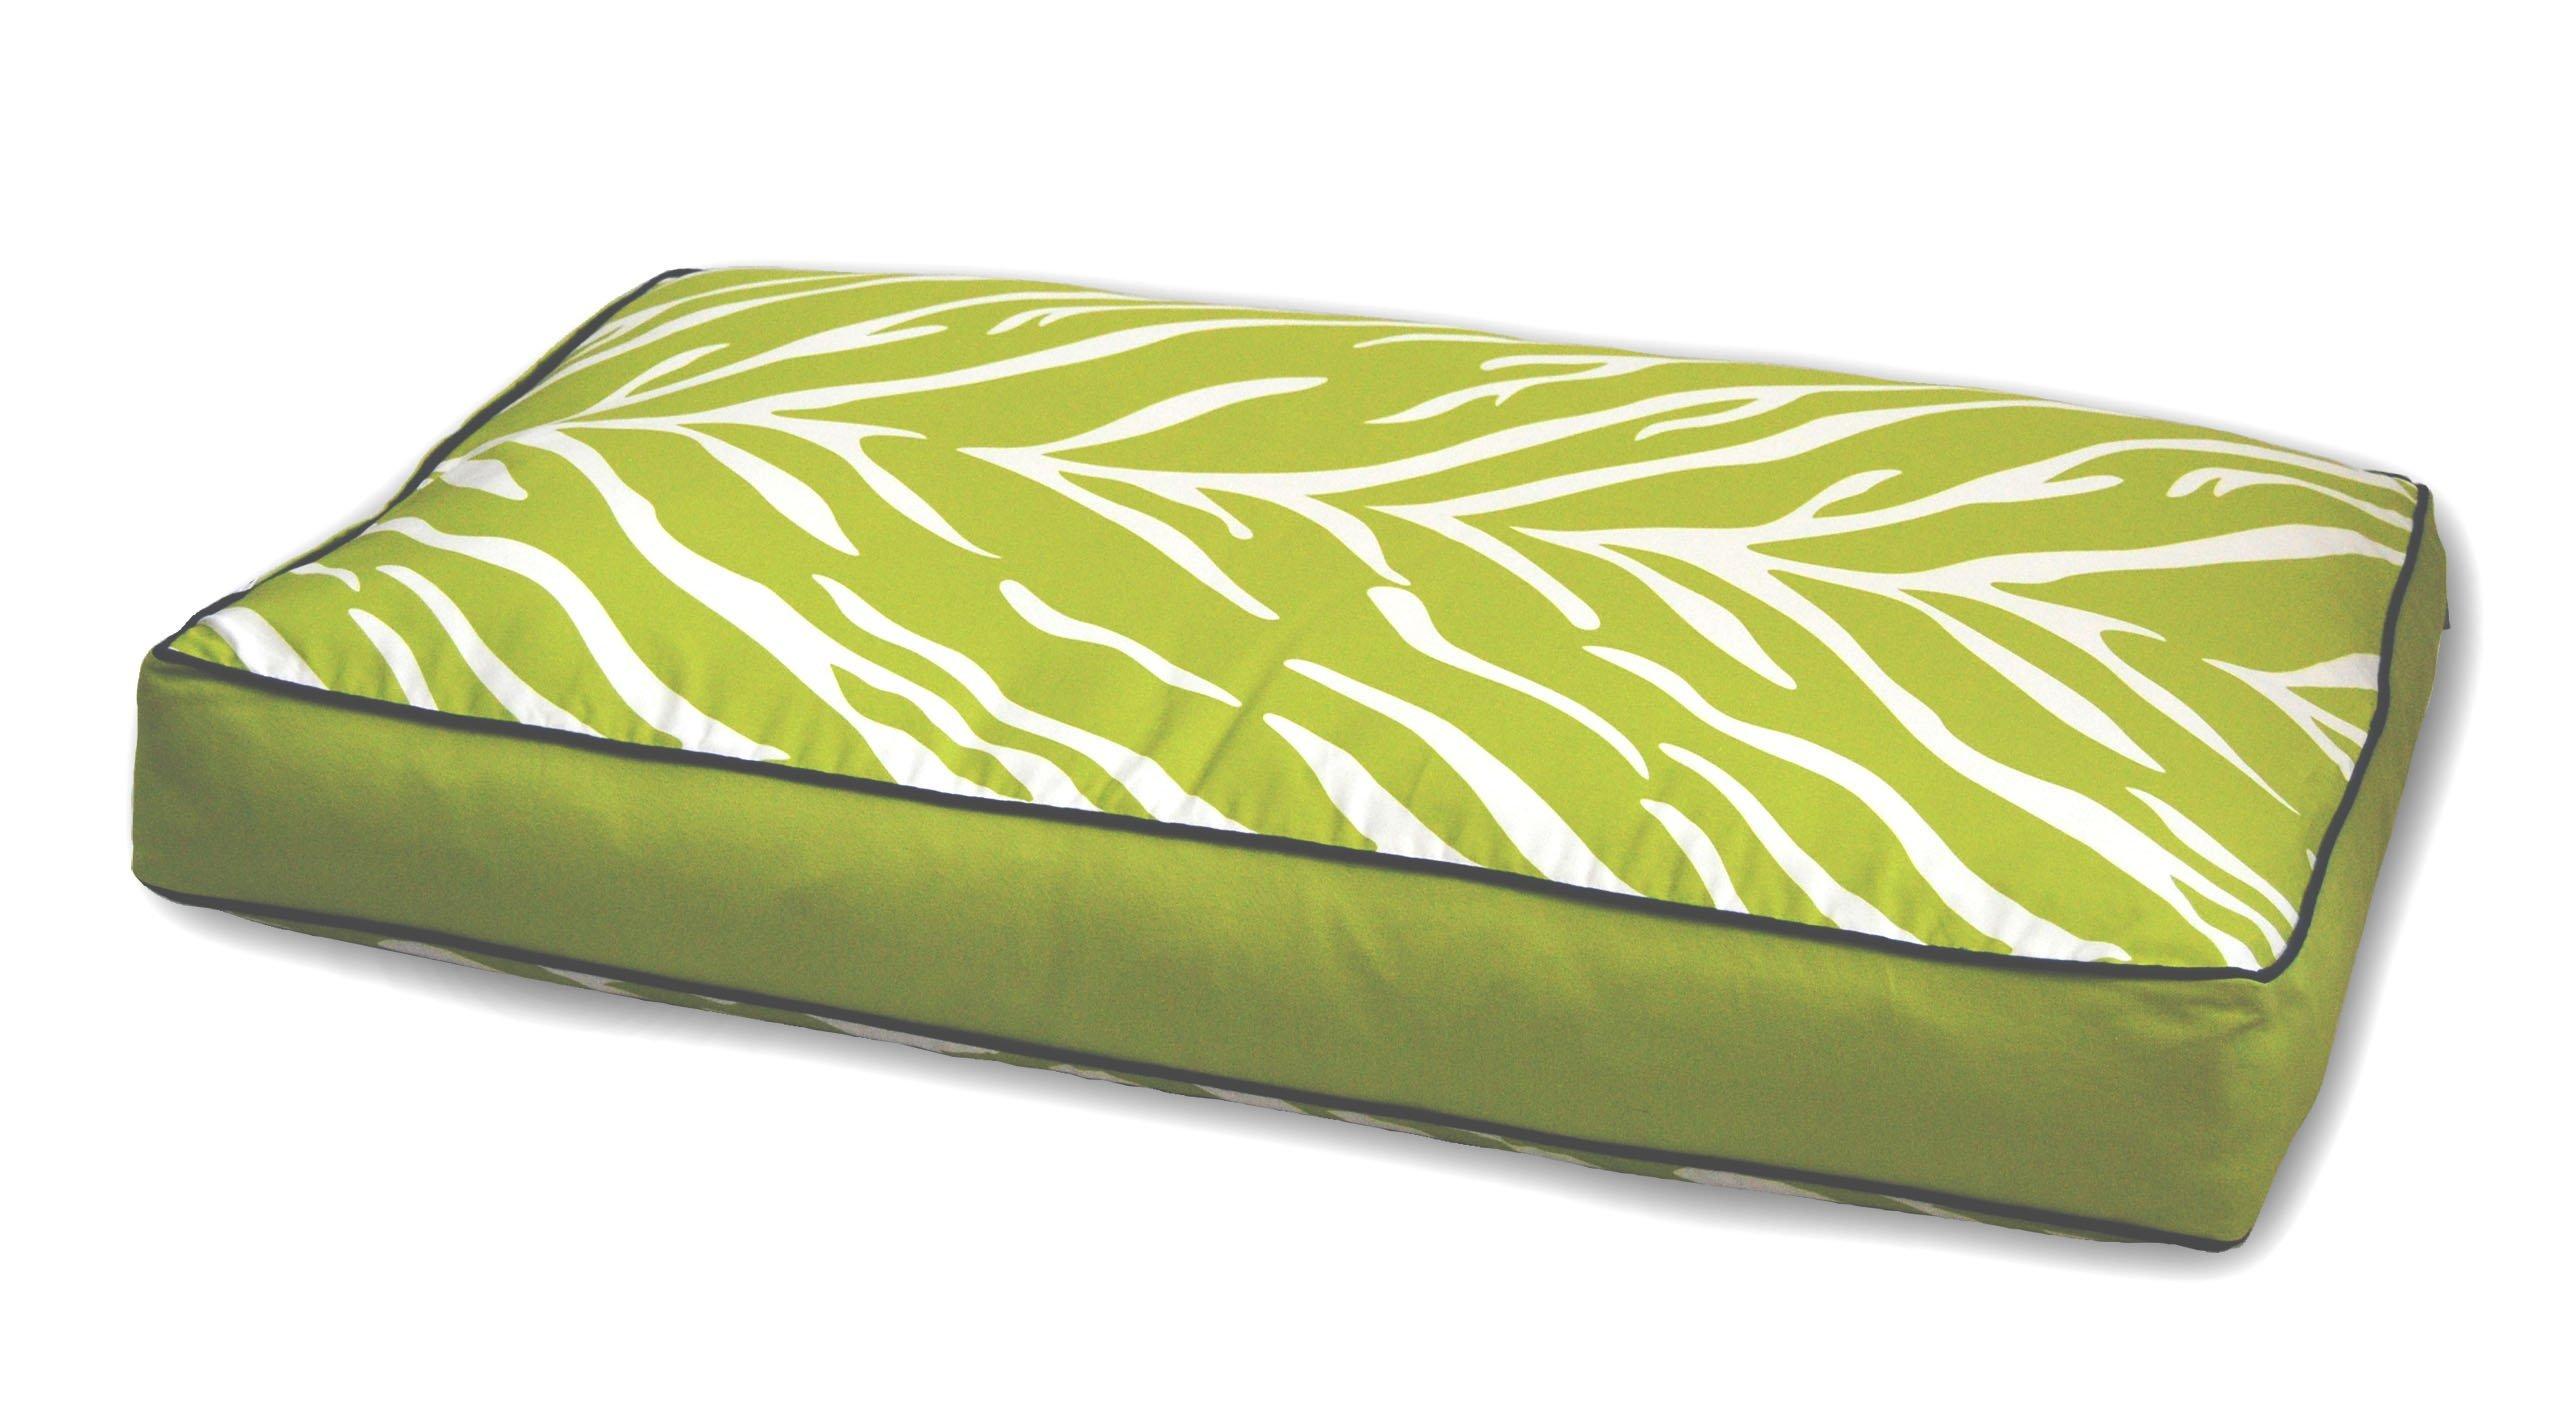 EZ Living Home Zebra Memory Foam Topper Pillow Pet Bed Size: Medium (36'' H x 27'' W), Color: Lime